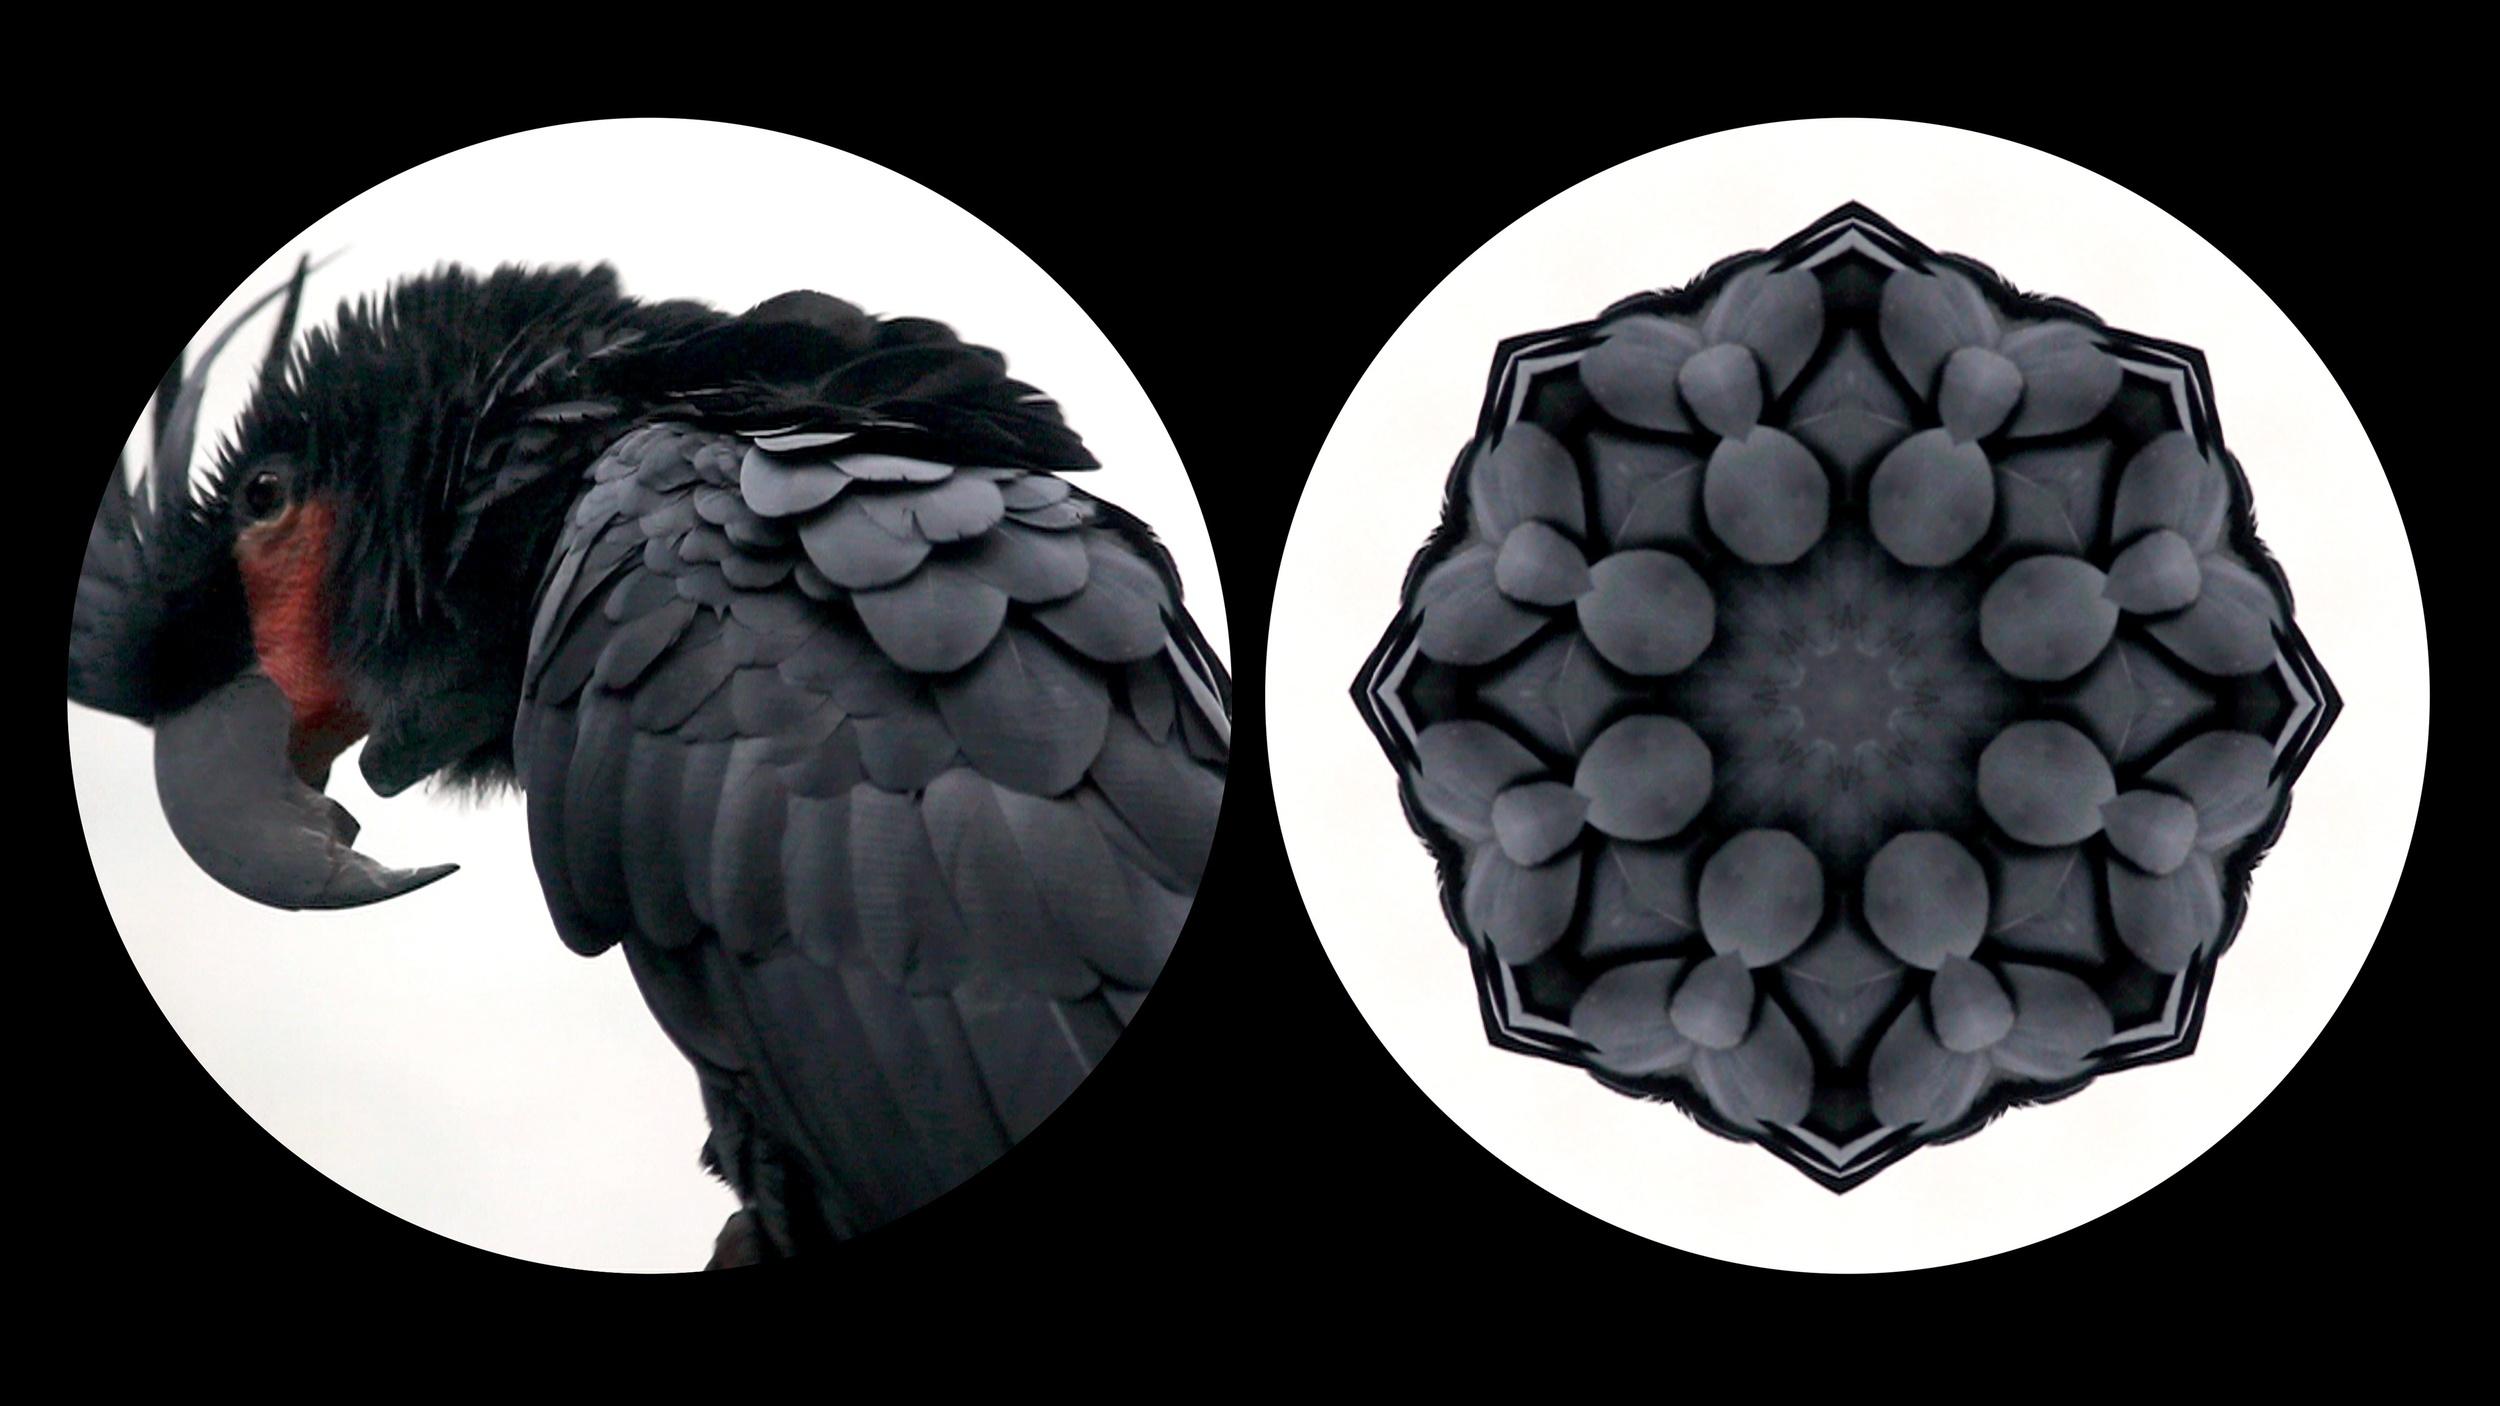 Leslie Thornton  Binocular Series: Black Parrot, HD video, 4min. 2012